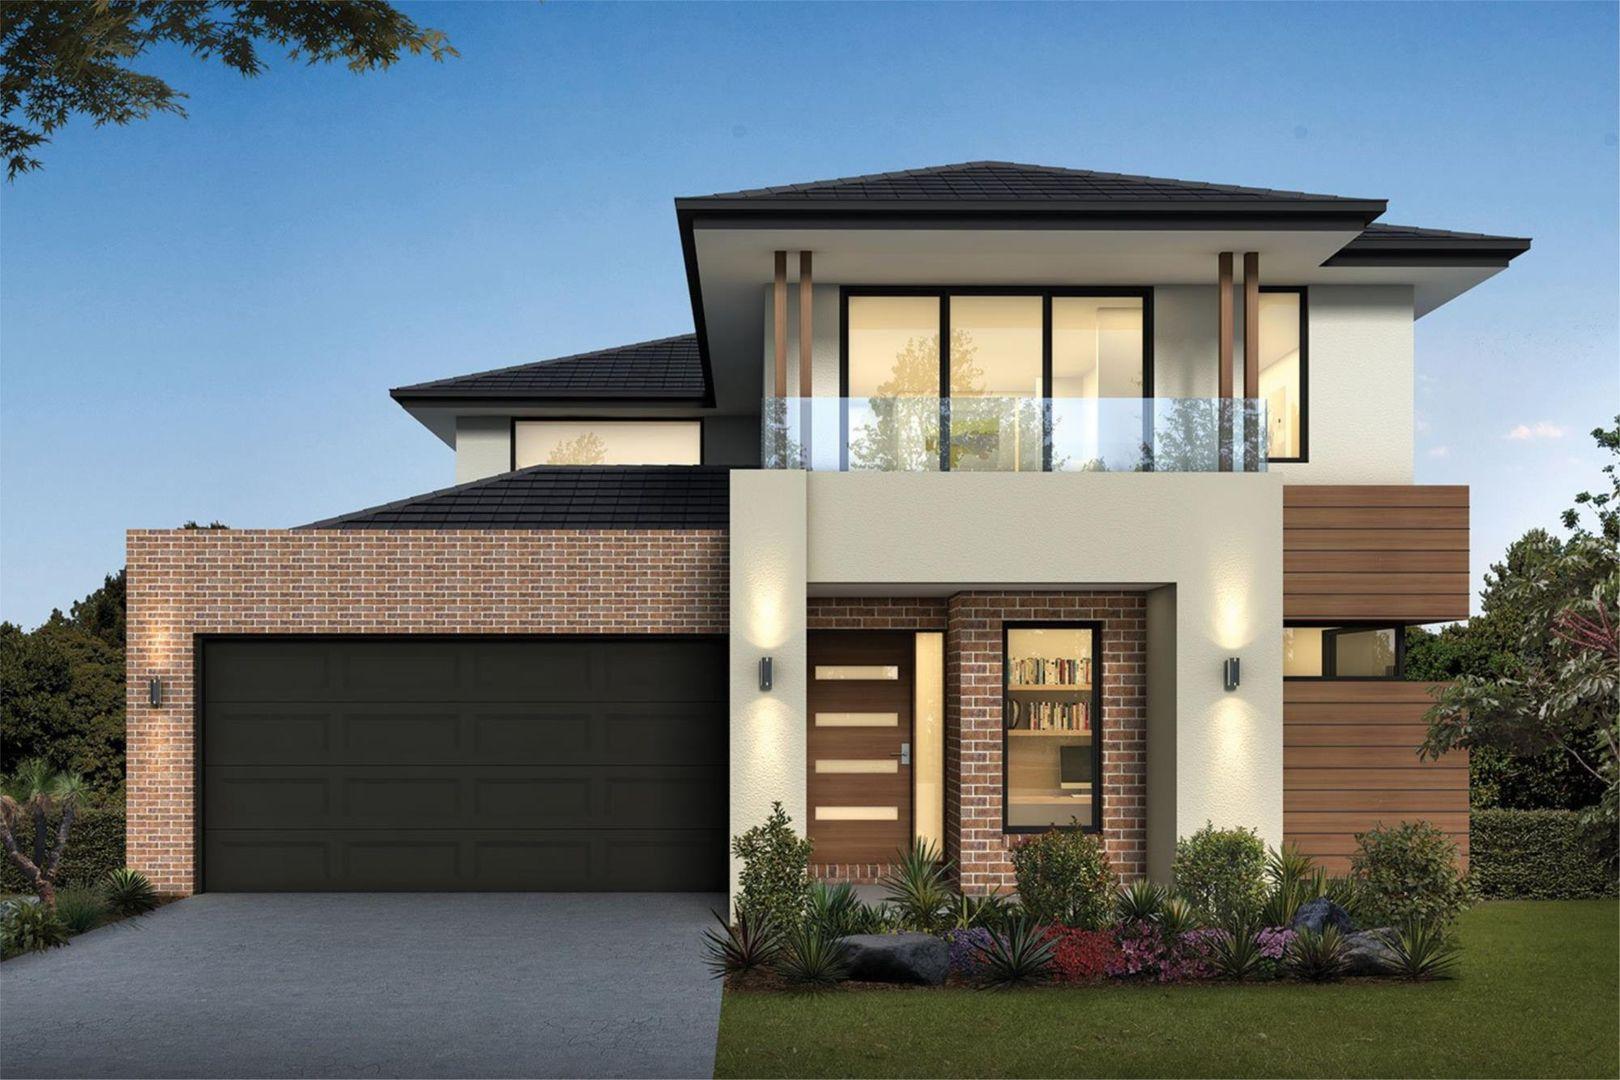 Lot 472 Hobby Street, Pallara QLD 4110, Image 0